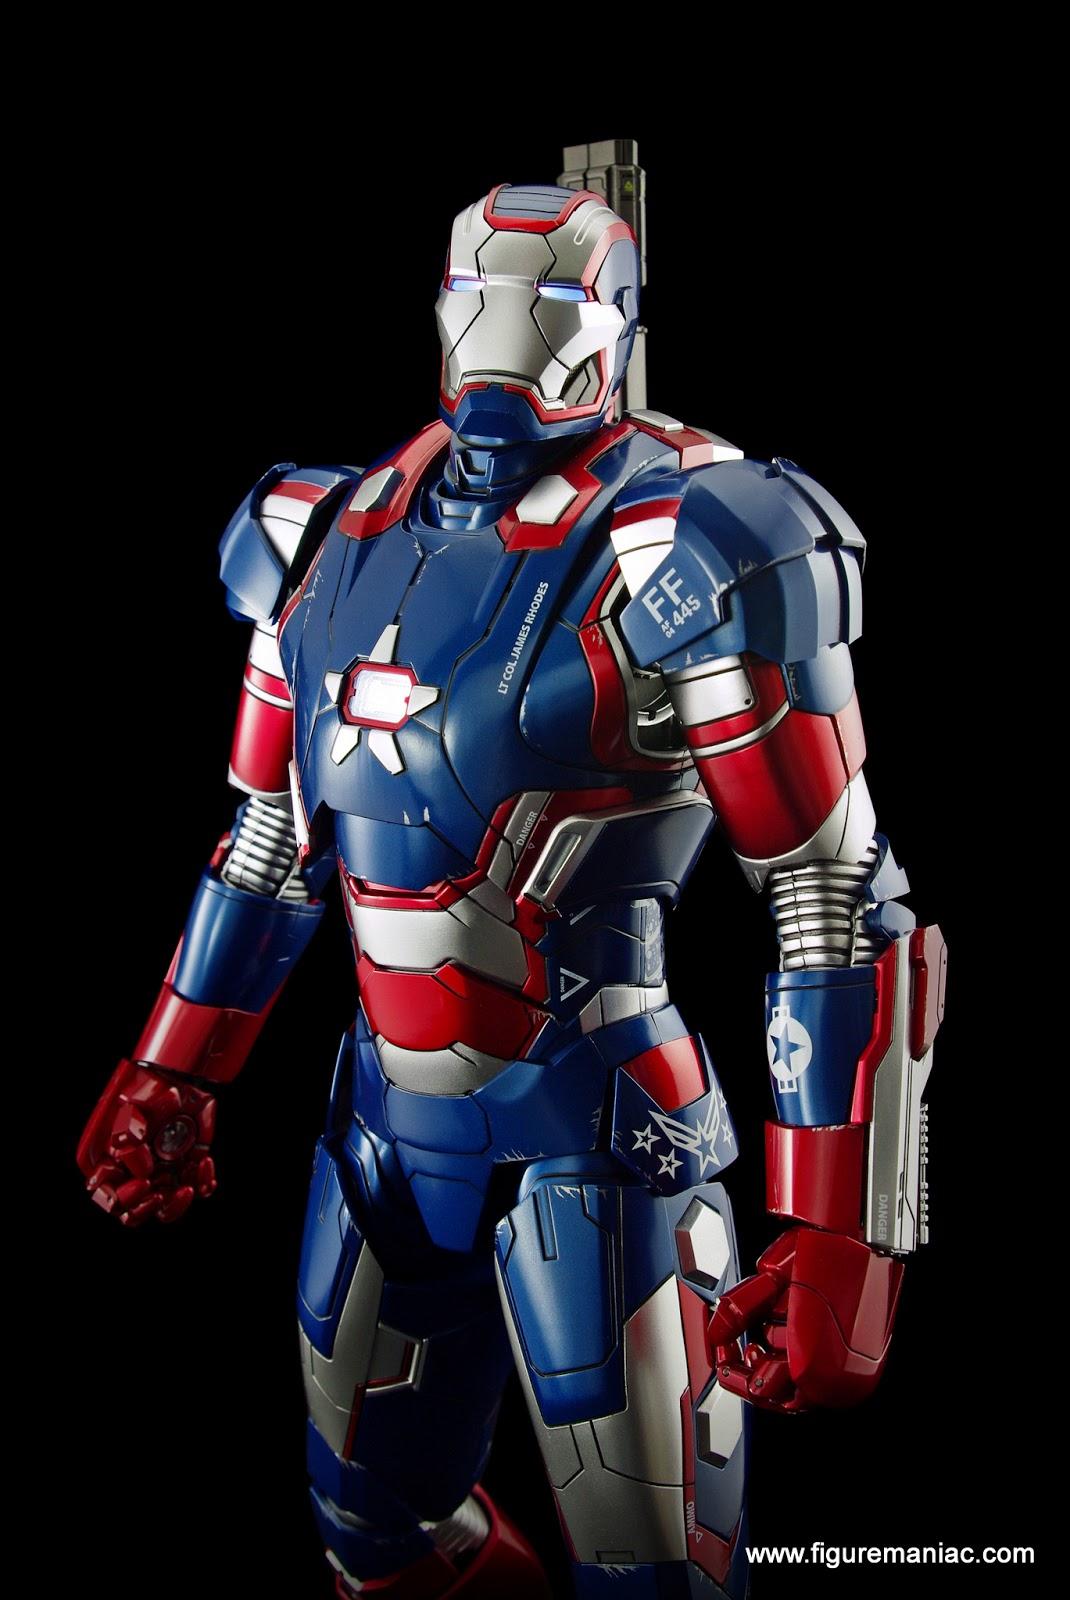 hot toys iron man 3 iron patriot part 1 figure maniac. Black Bedroom Furniture Sets. Home Design Ideas